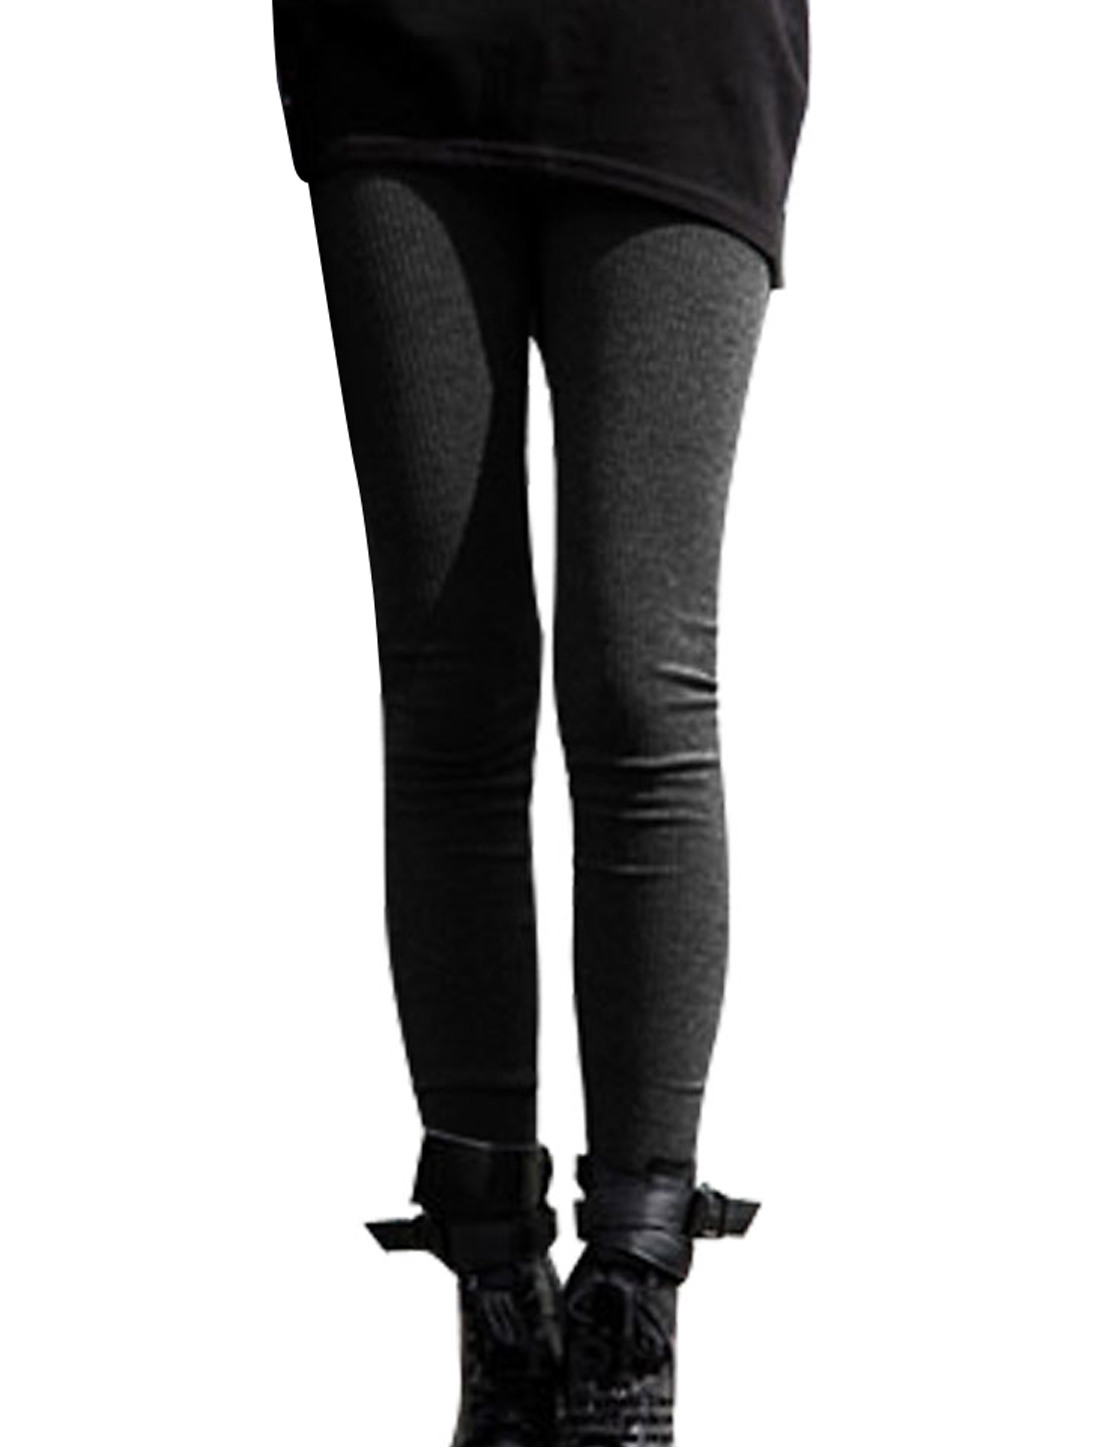 Ladies Black Elastic Waist Form-fitting Cropped Leggings XS